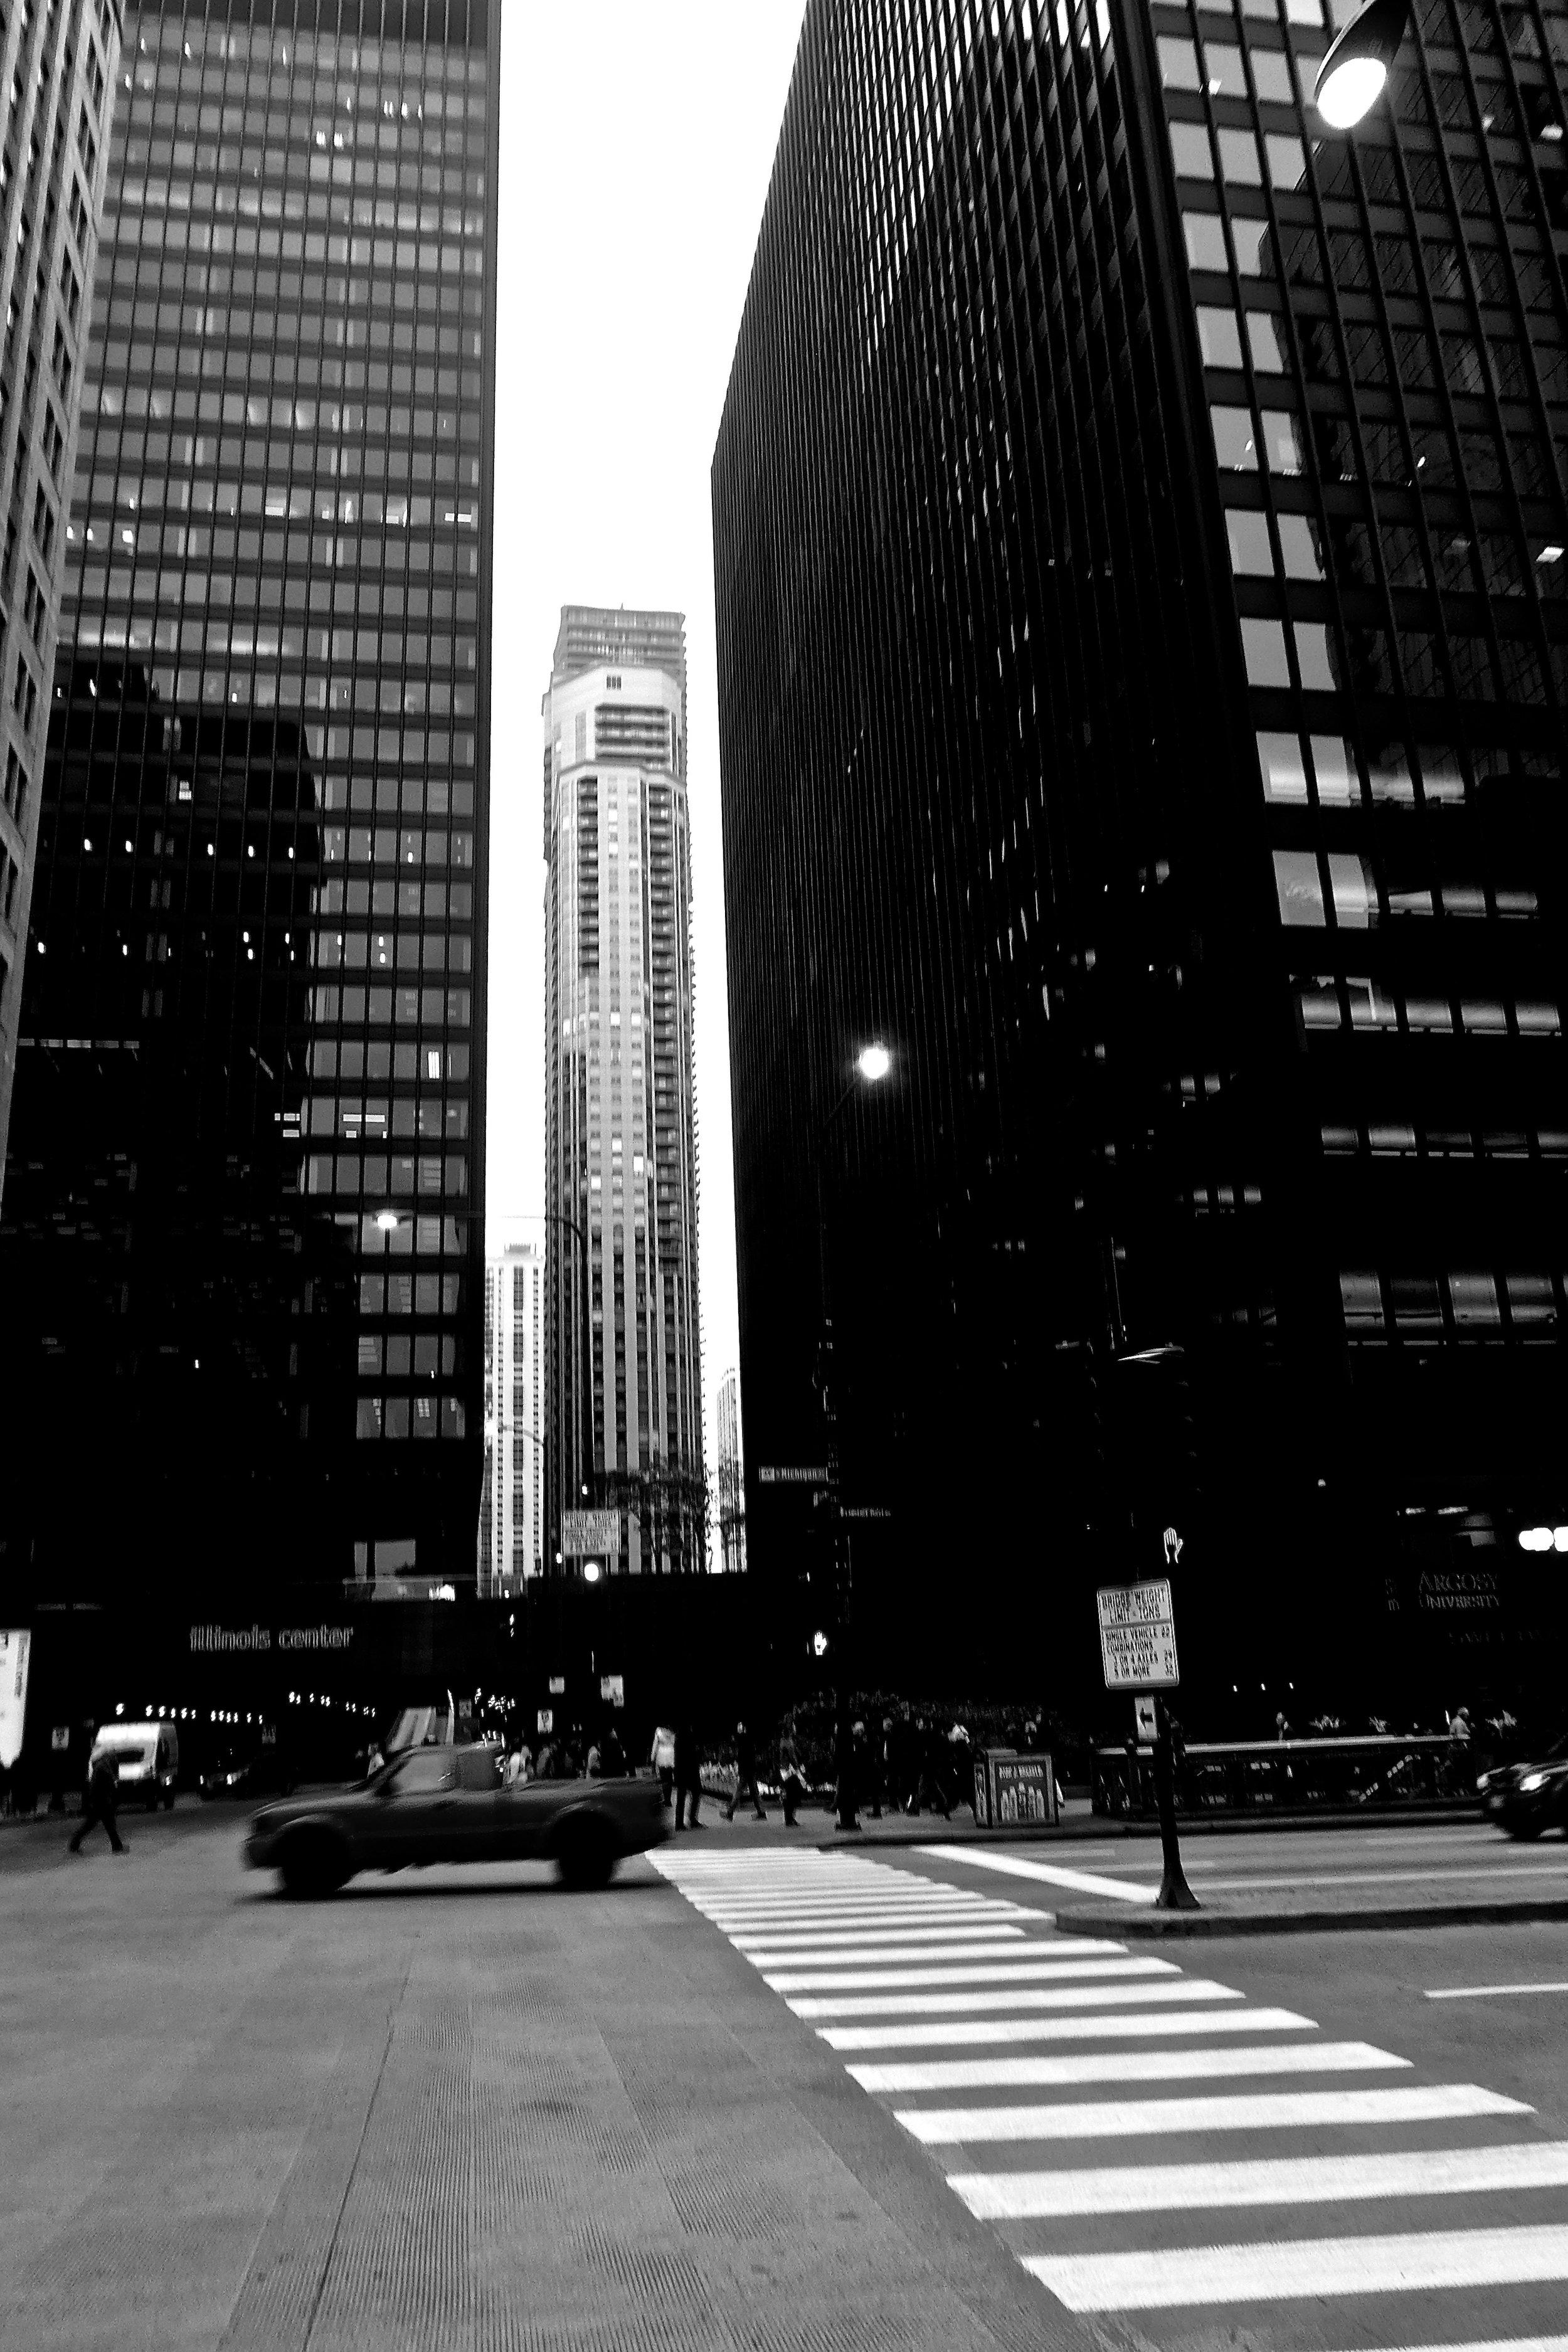 David_Vogel_CHICAGO STREET CORNER.jpg